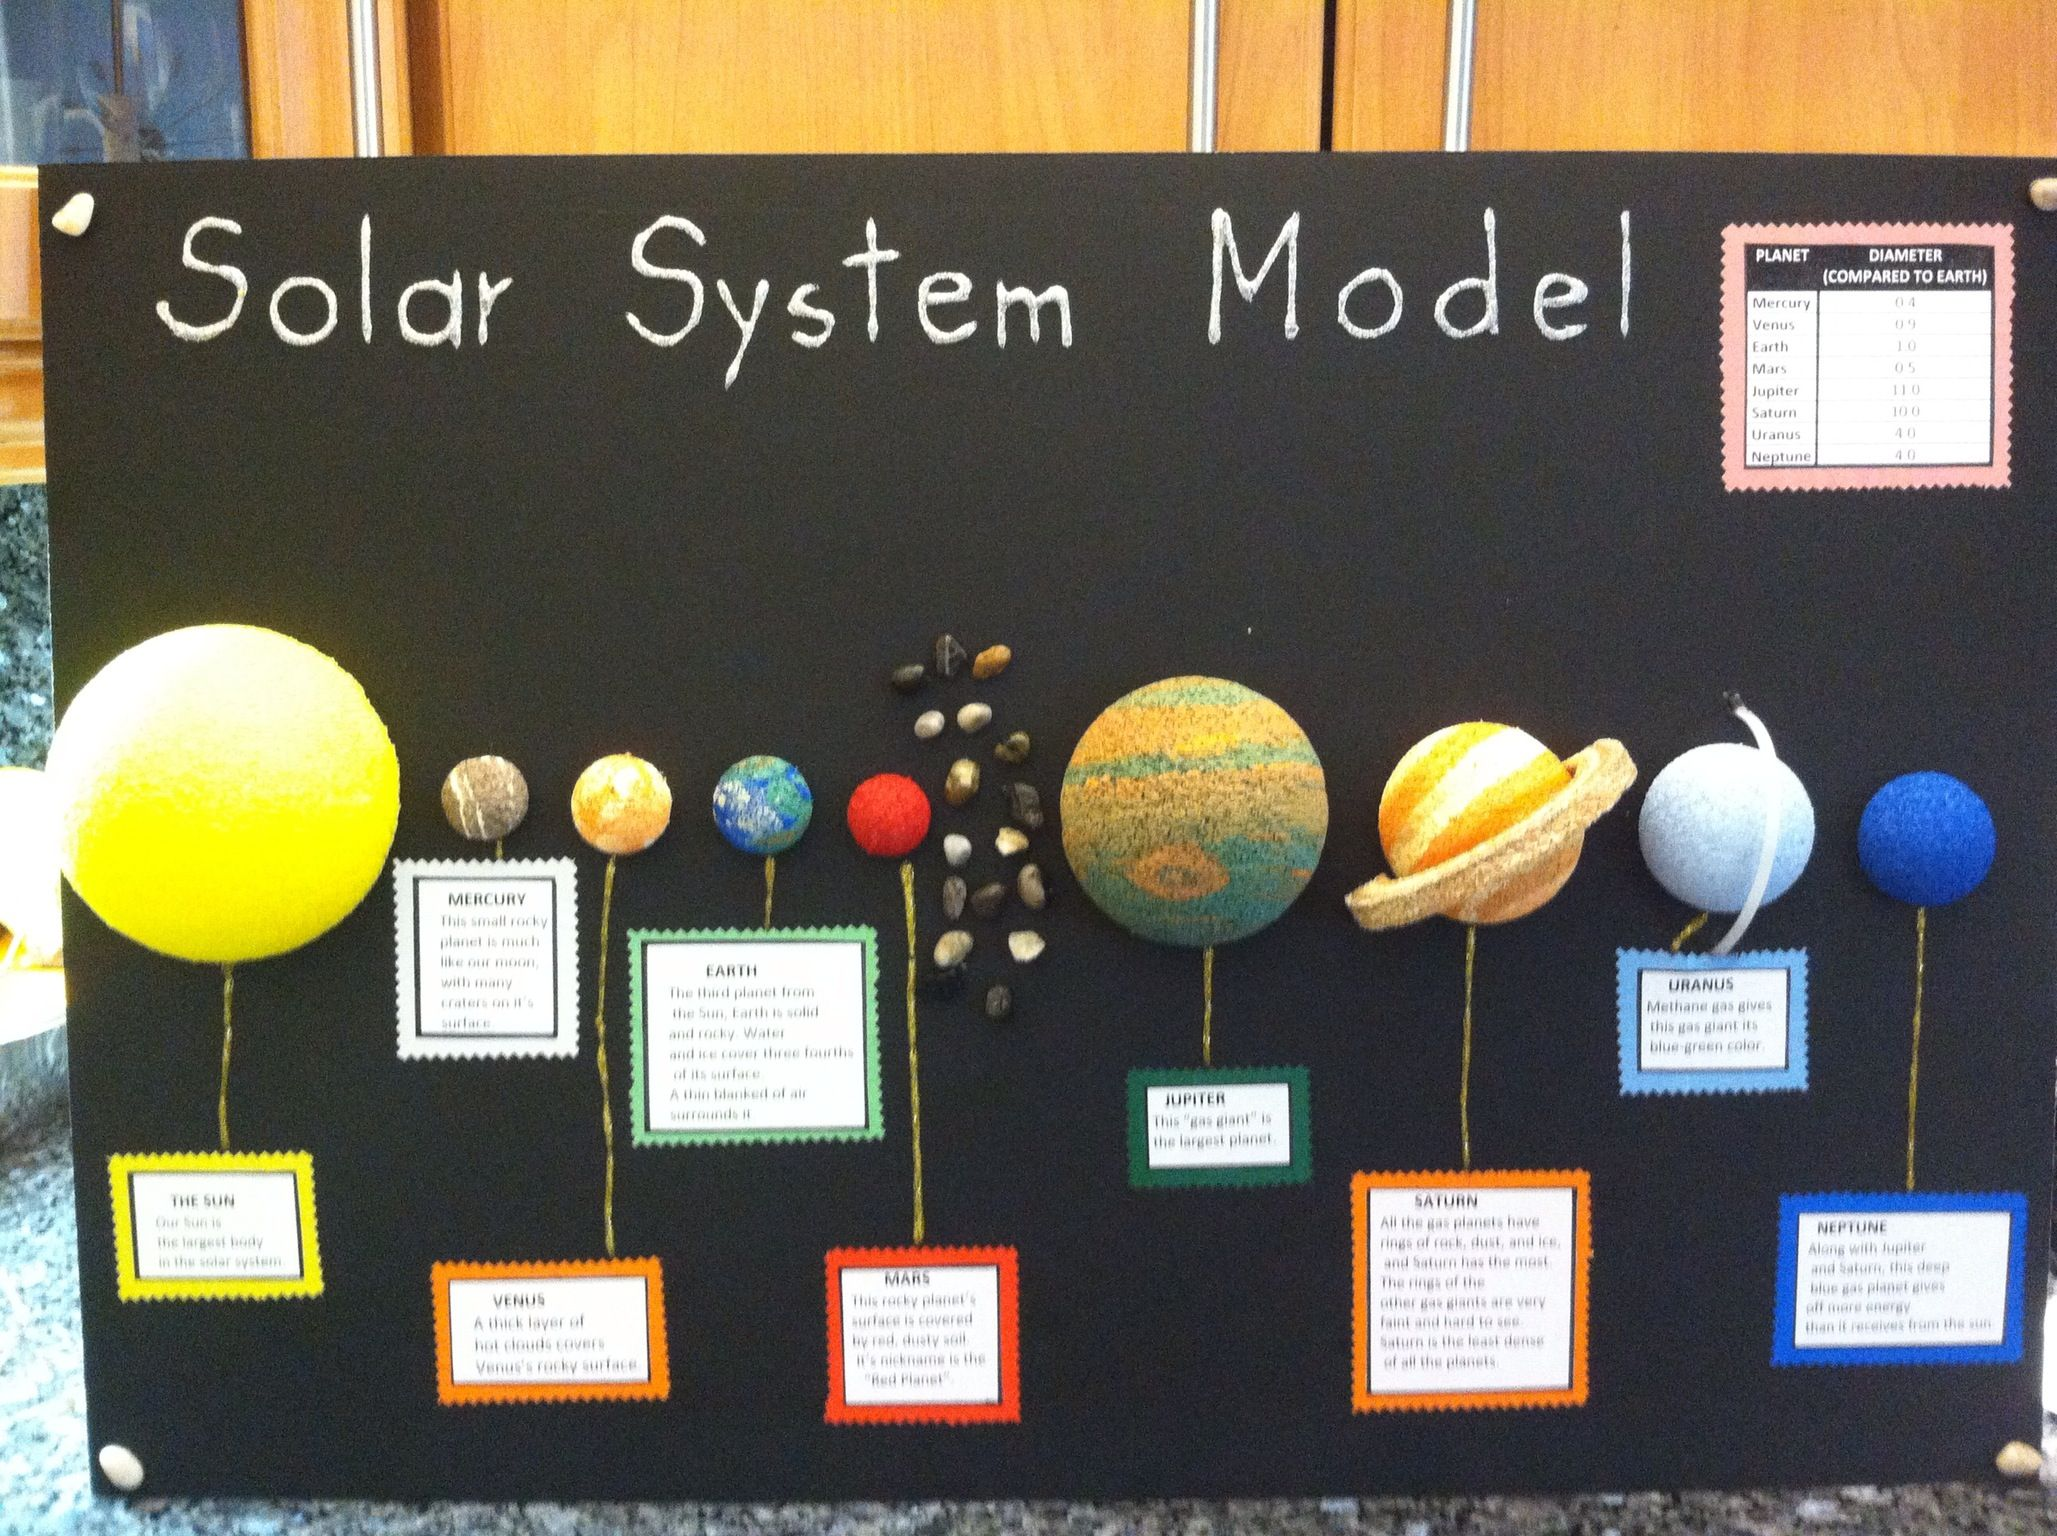 Solar System Model School Project